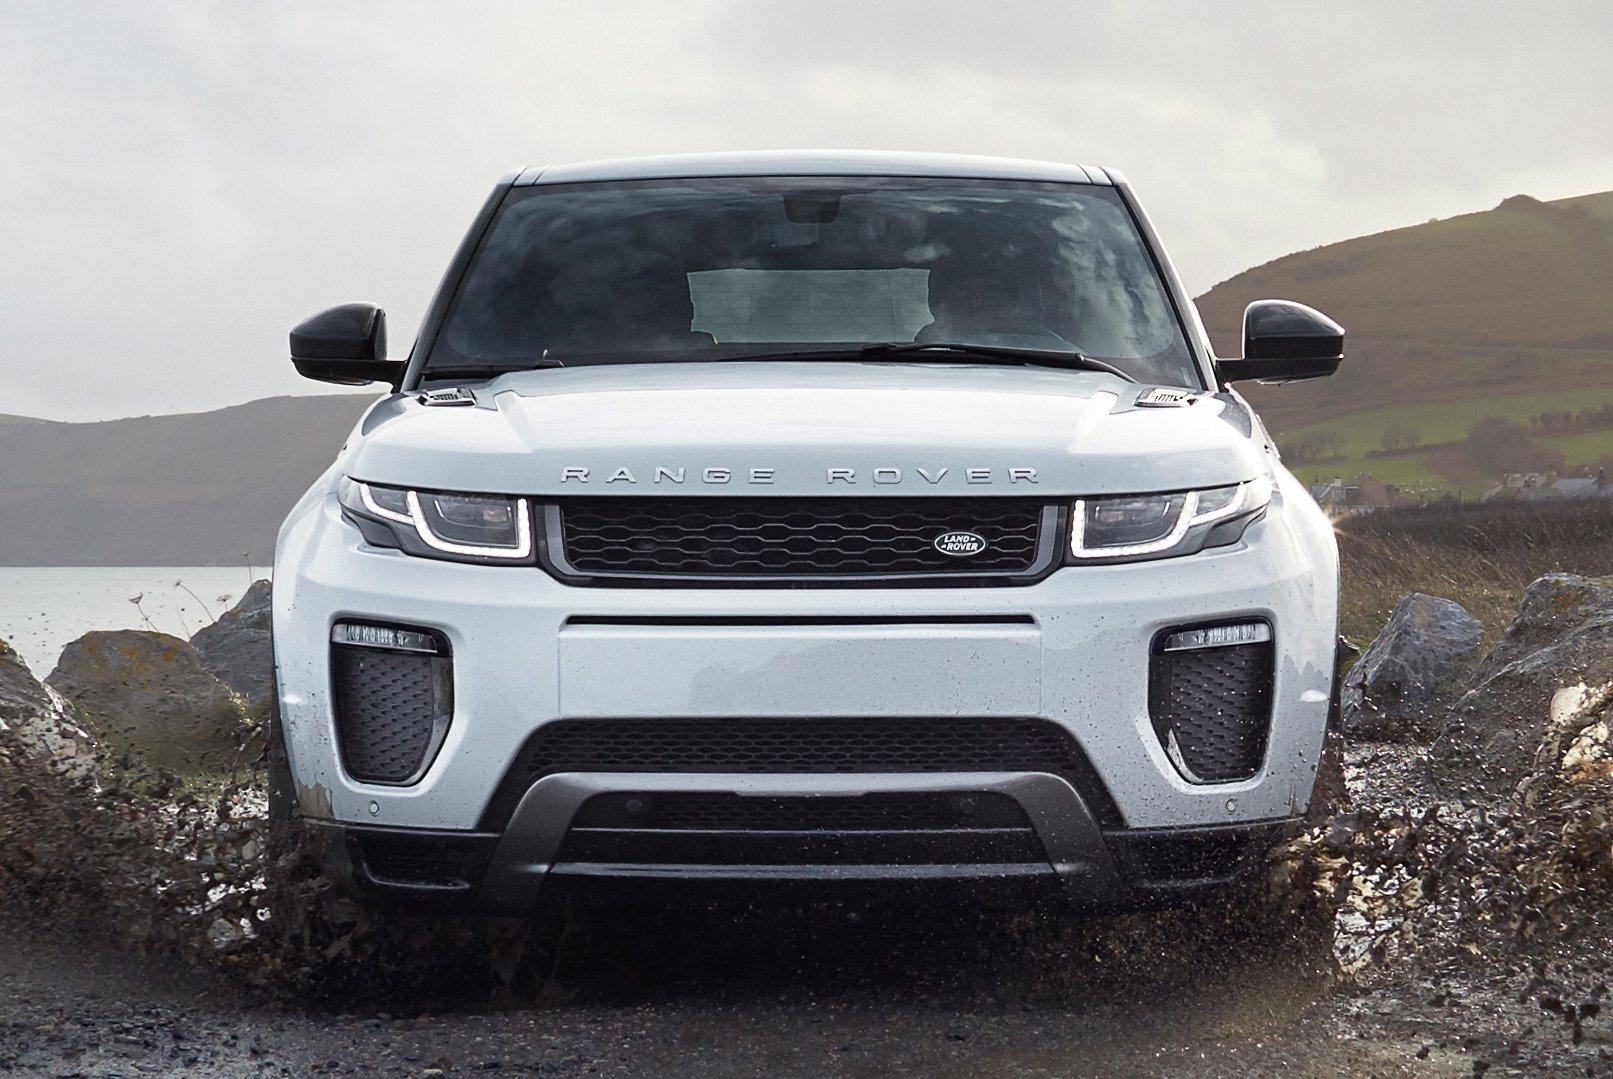 Evoque Range Rover >> 2016 Range Rover Evoque facelift gets subtle updates Paul Tan - Image 313358